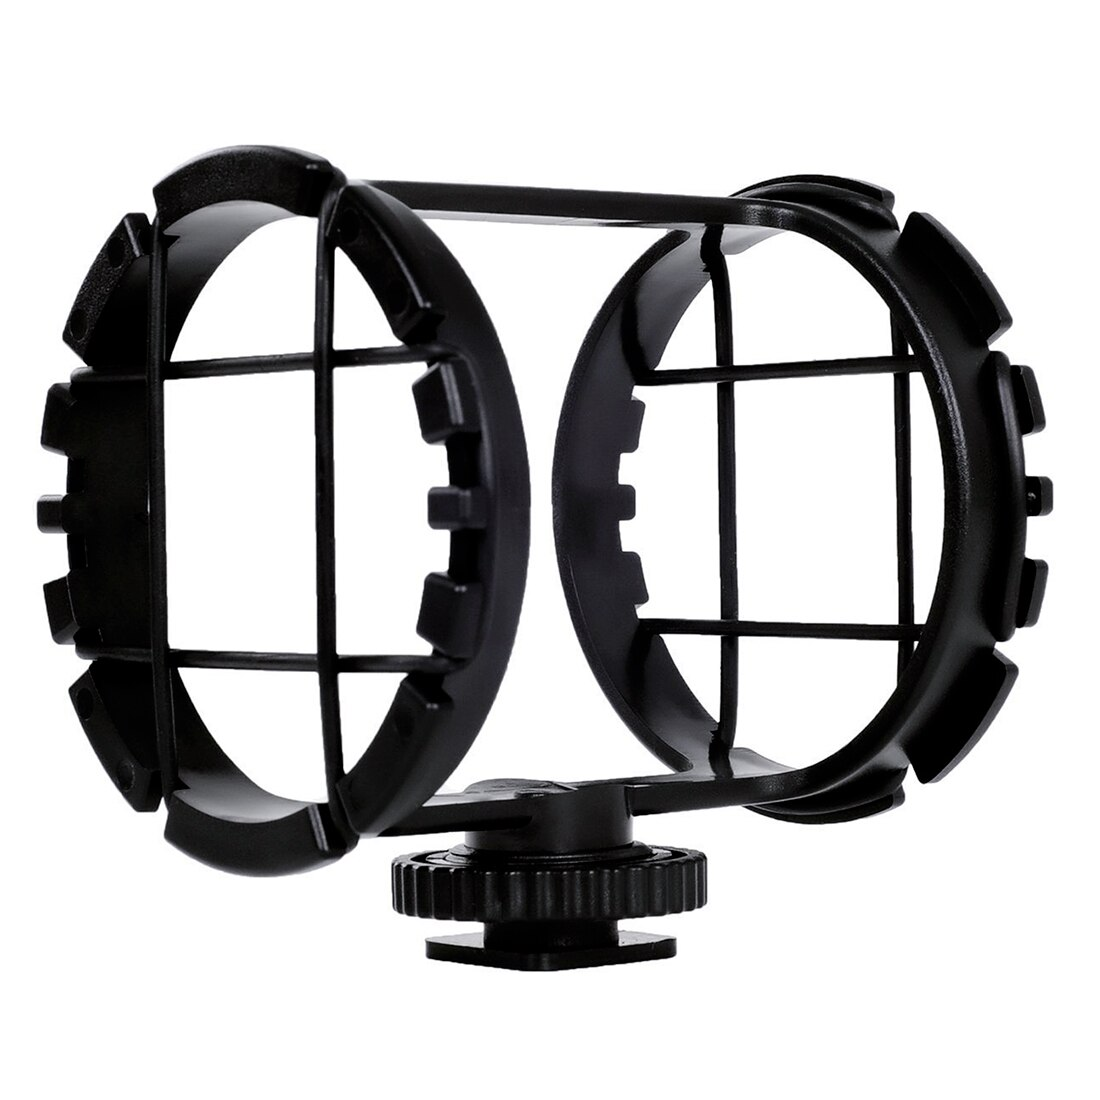 "BOYA, Zapata para cámara de BY-C03, soporte para miniteléfonos de 1 ""a 2"" de diámetro (se ajusta al Zoom H1)"